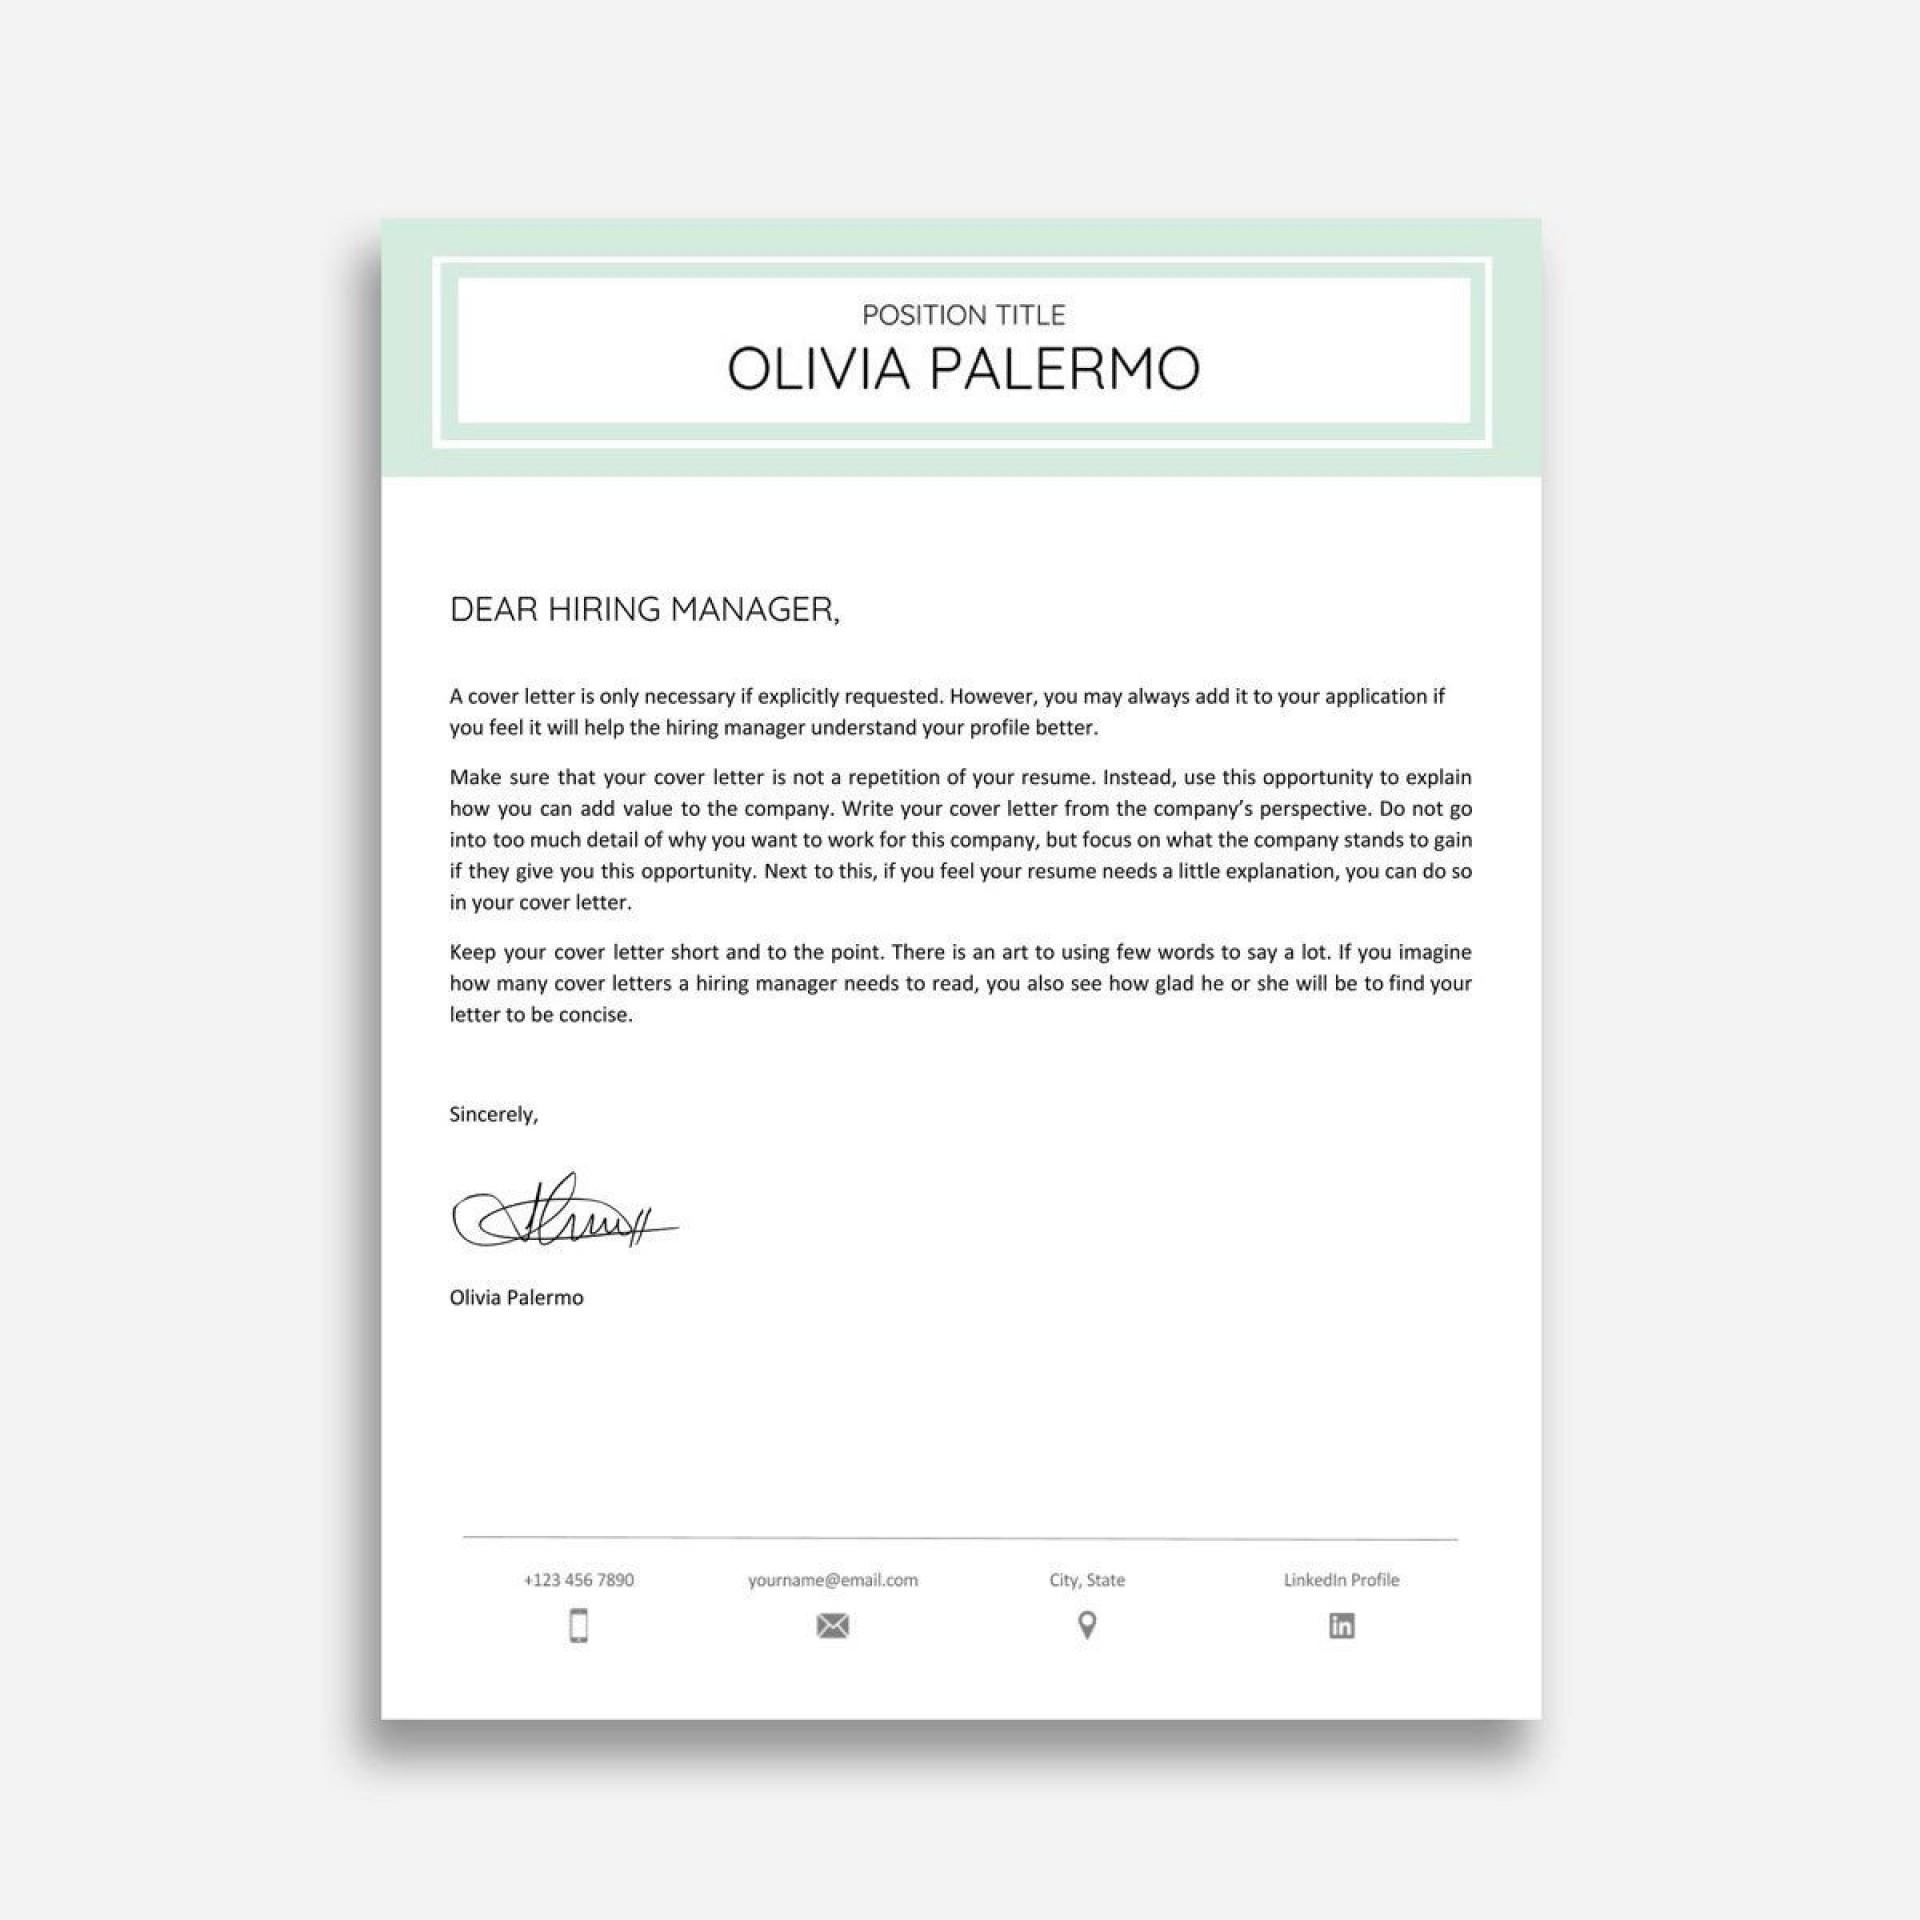 004 Amazing Google Doc Cover Letter Template Design  Swis Free Reddit1920